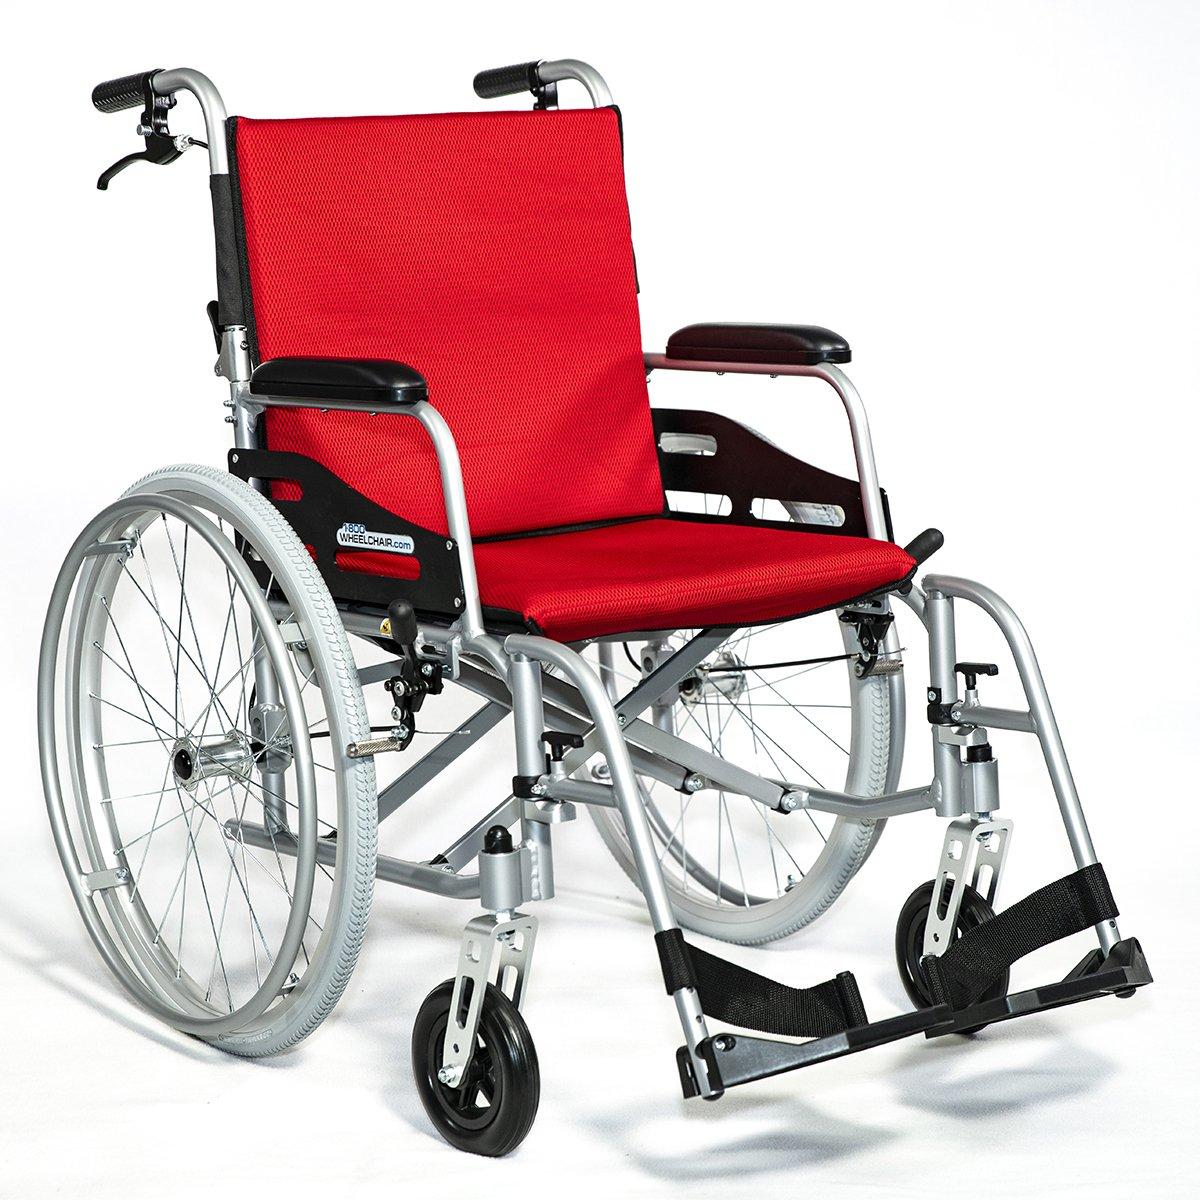 Featherweight 13.5 lbs. Wheelchair